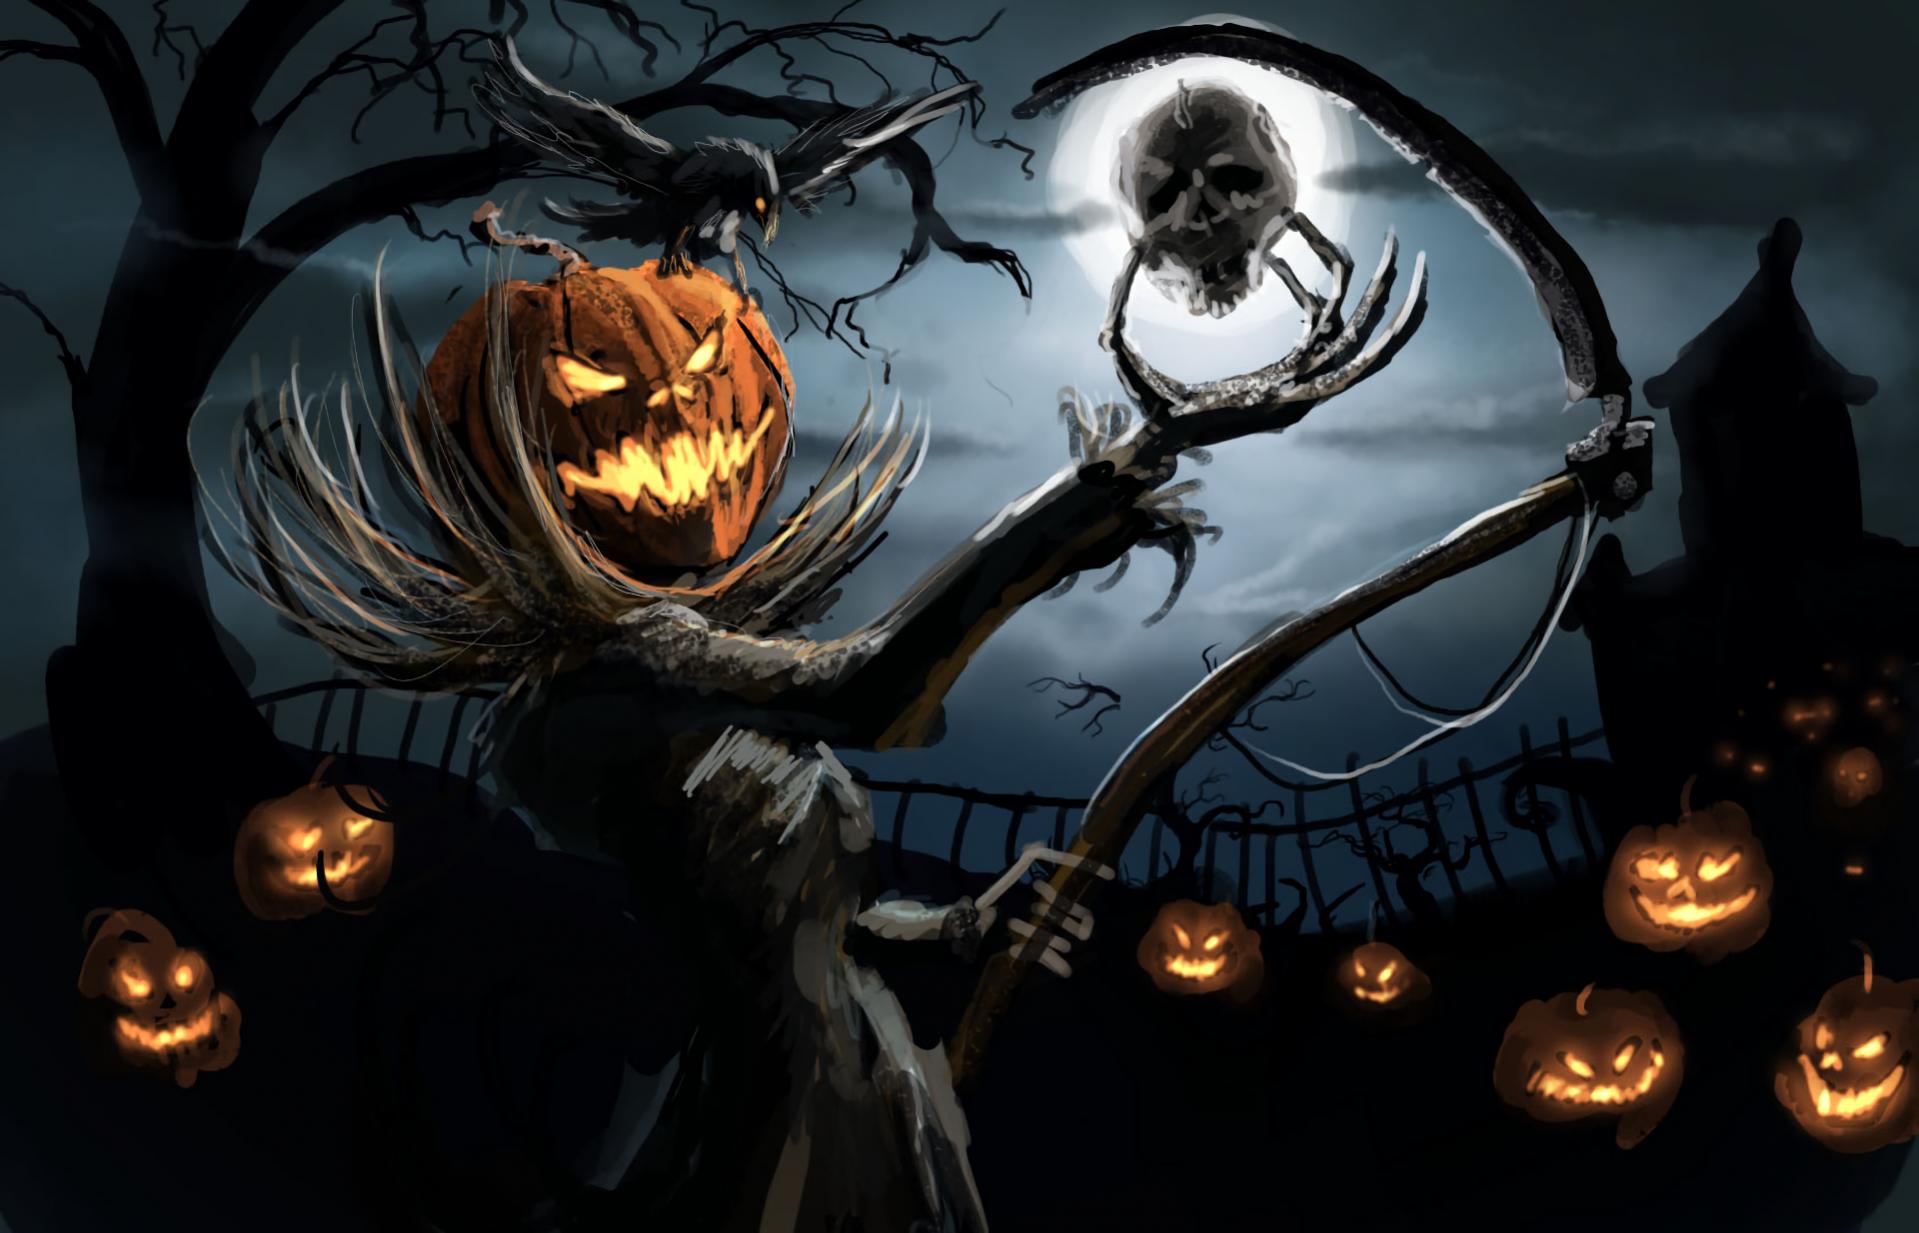 21 Halloween Wallpapers   JPG AI Illustrator Download 1919x1233